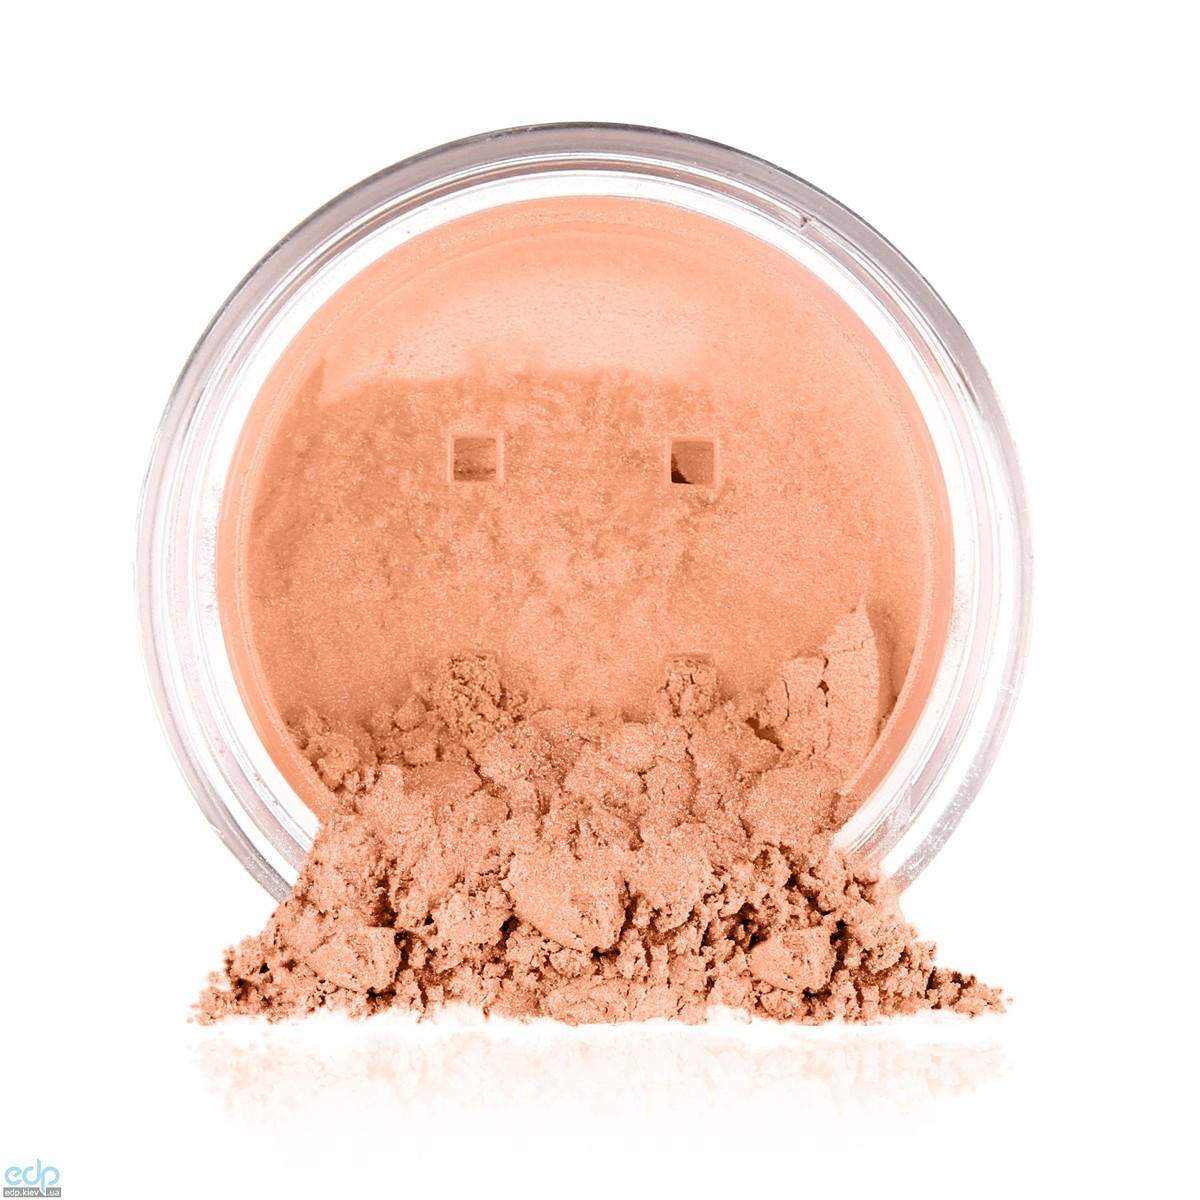 FreshMinerals - Минеральные рассыпчатые тени Mineral Loose Eyeshadow Earthy - 1.5 g (905653)